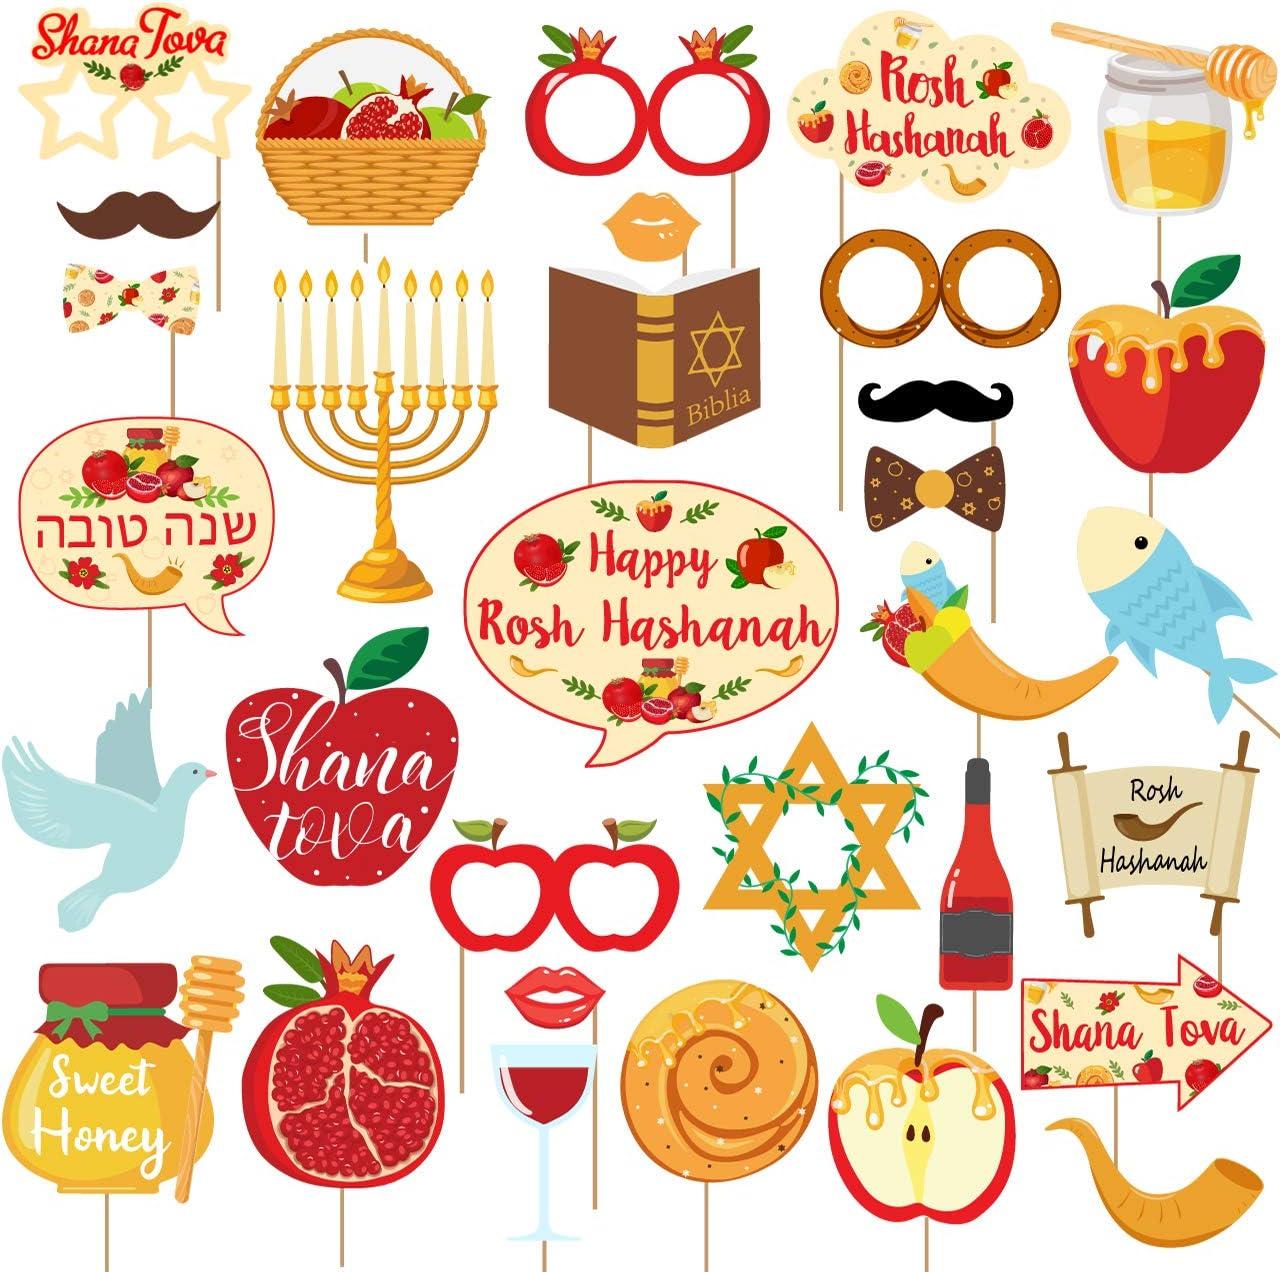 32 Pcs Rosh Hashanah Photo Booth Props Jewish New Year Decorations Shana Tova Honey Pomegranate Fish Centerpieces for Jewish Holiday Party Supplies